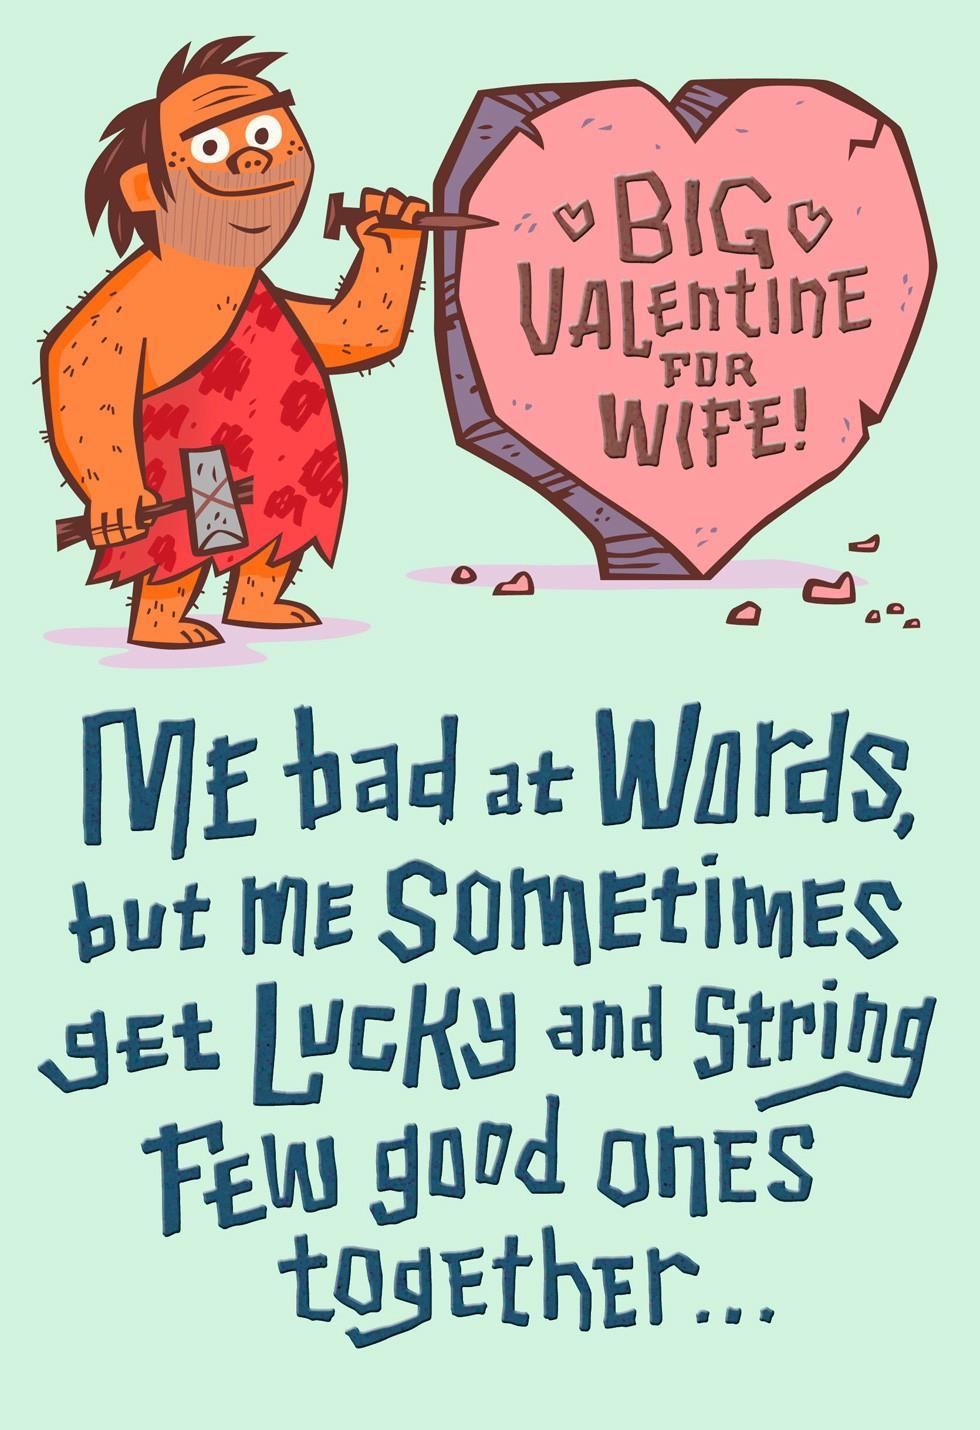 Caveman Big Valentine For Wife Valentines Day Card Greeting – Valentine Day Cards for Wife